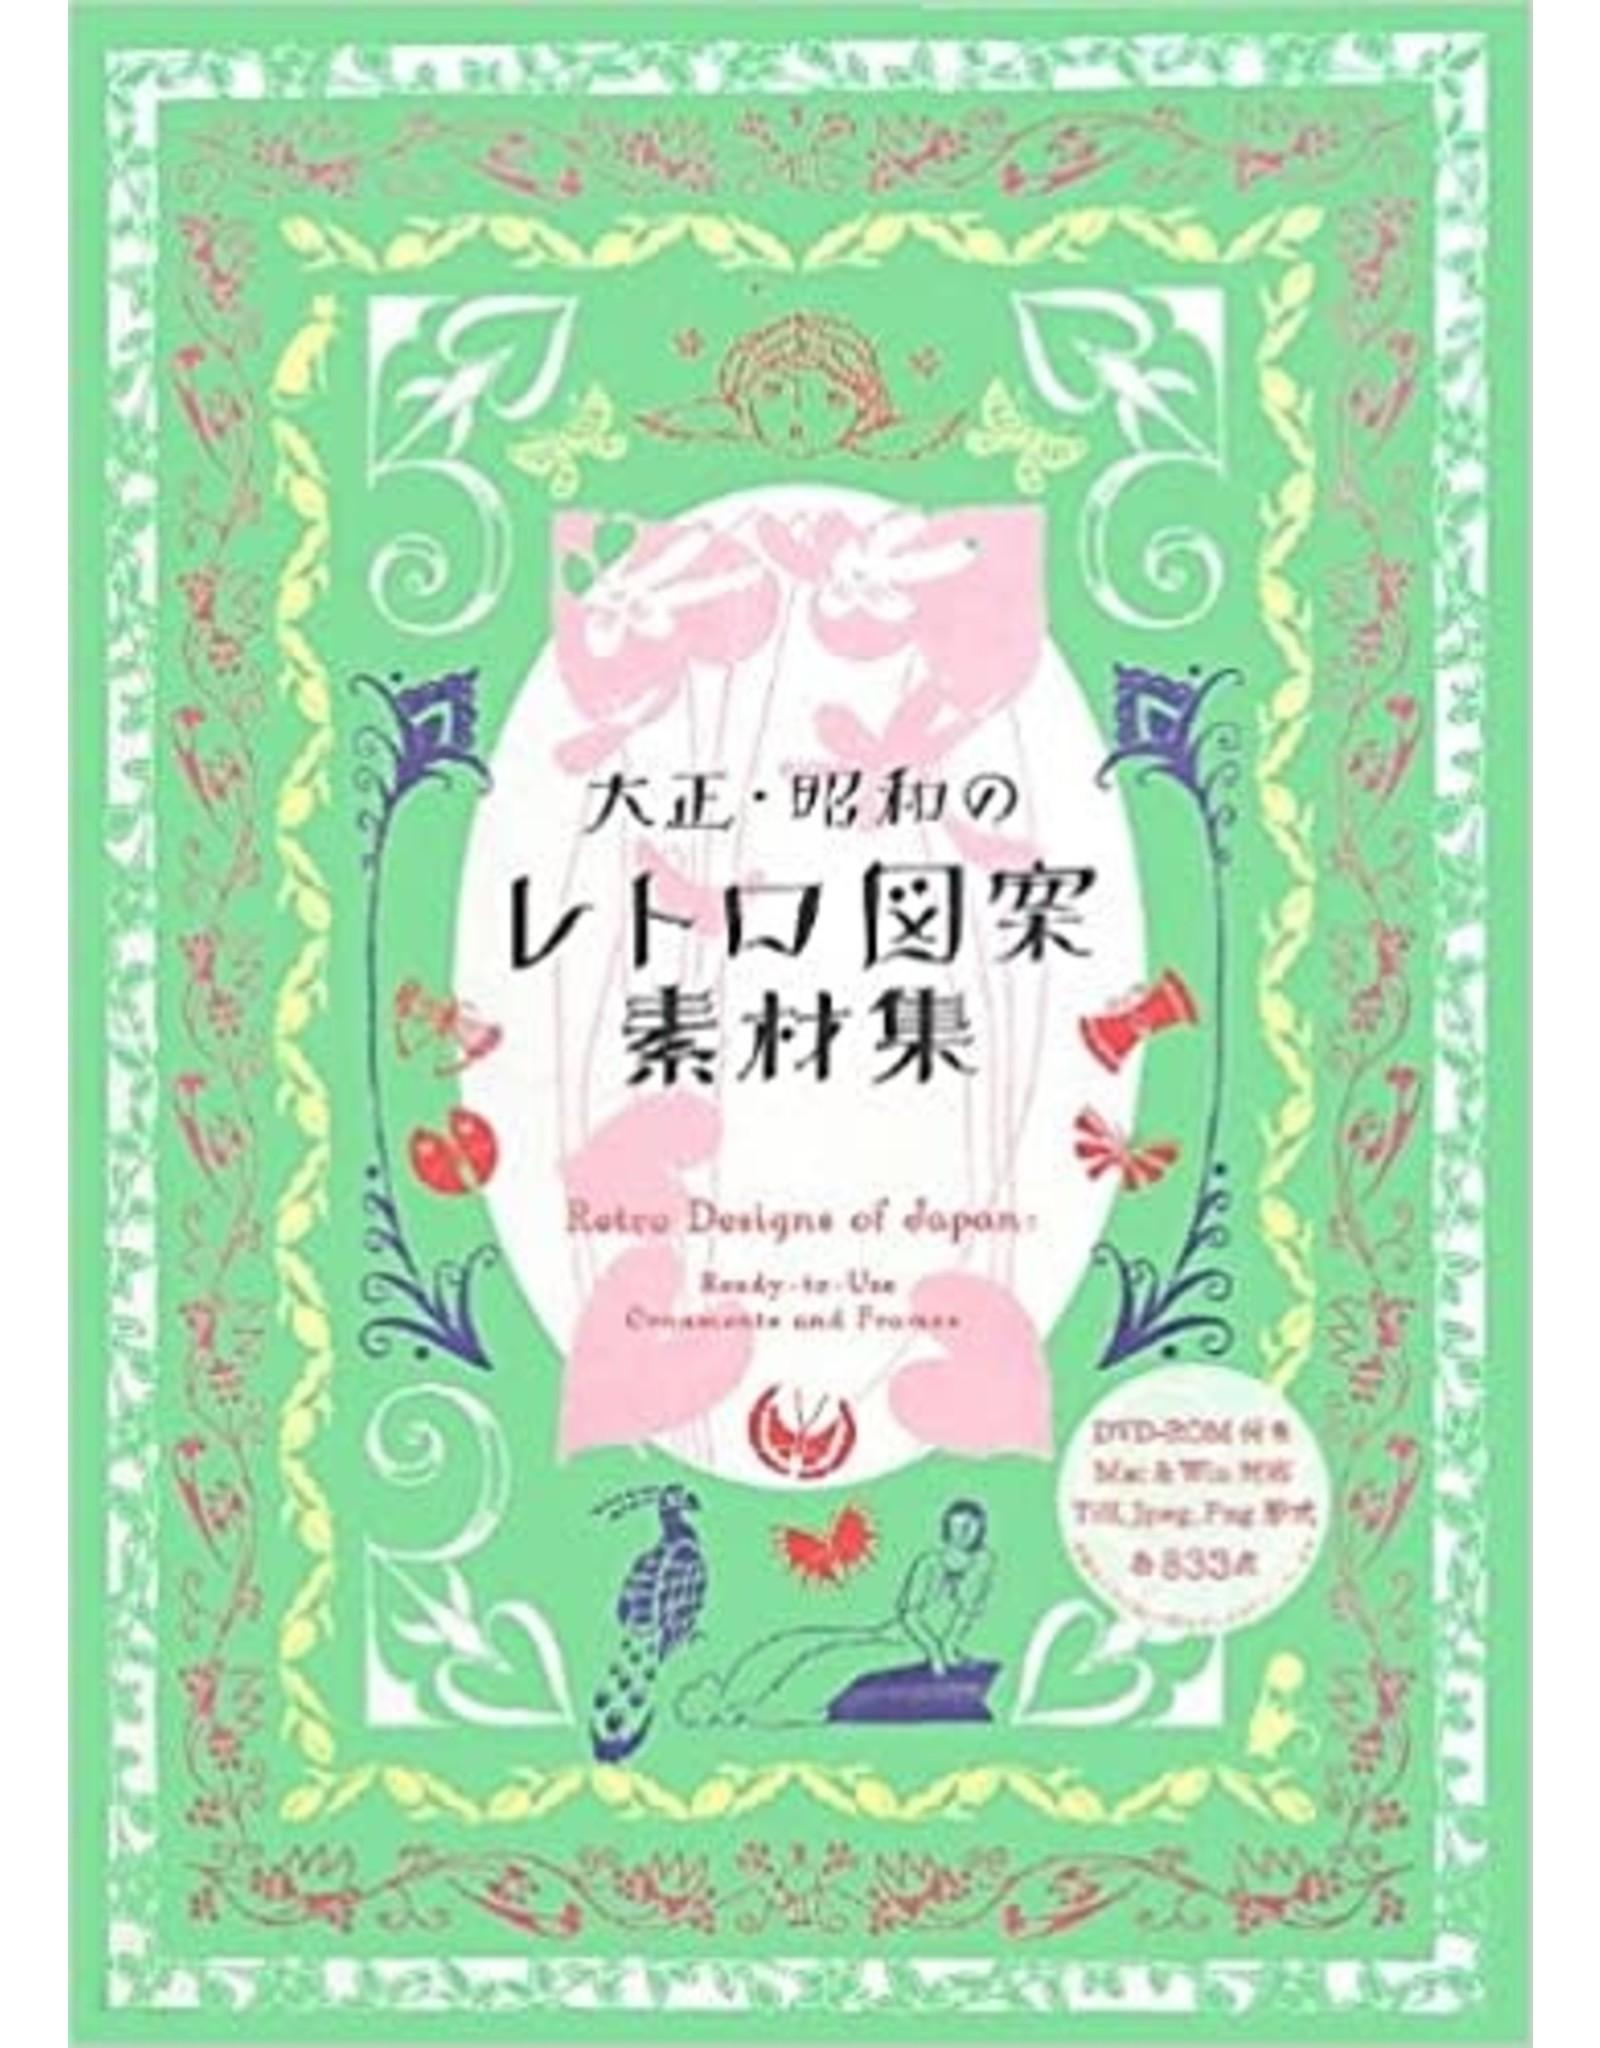 PIE INTERNATIONAL RETRO DESIGNS OF JAPAN: